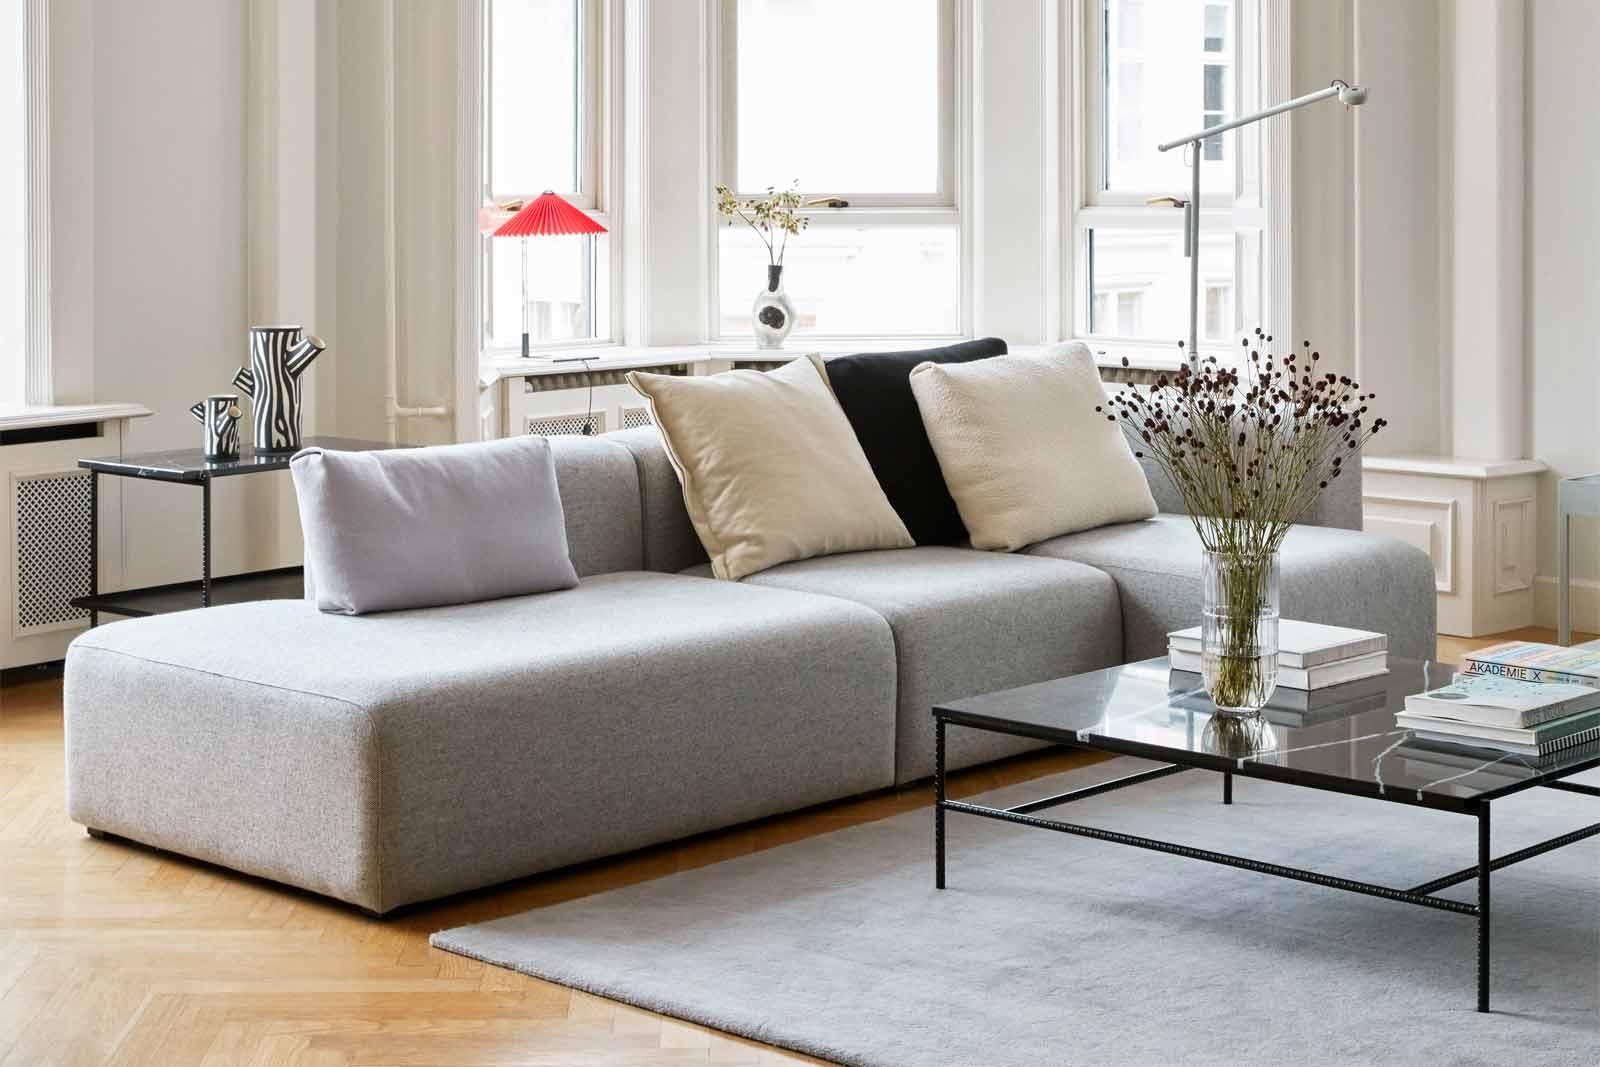 Boutique Danoise Basel Daenische Designer Moebel Accessoires Wohnen News Mags Sofa Hay 2021